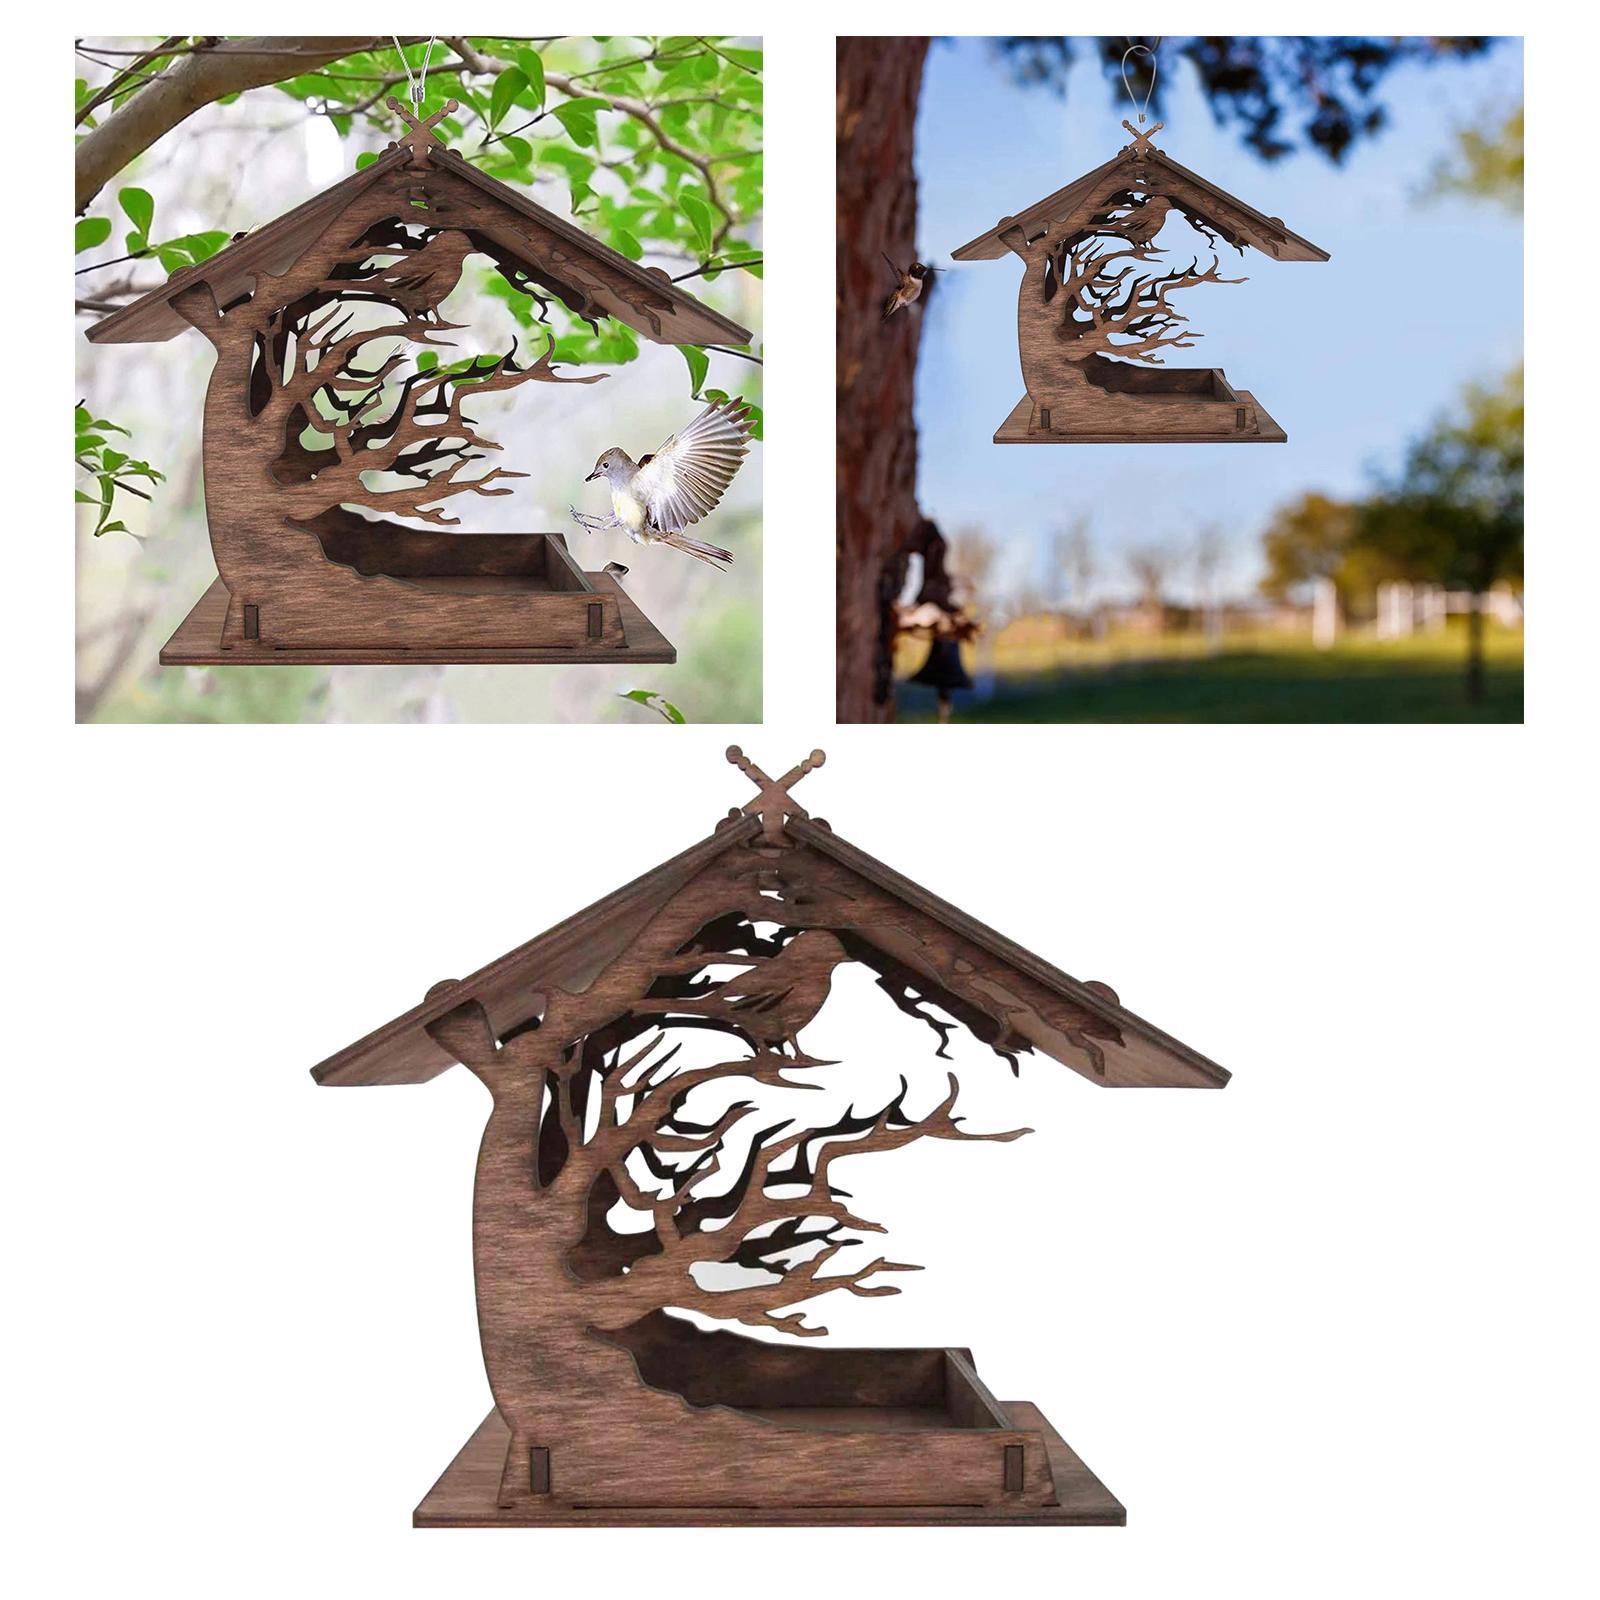 thumbnail 9 - Wooden Bird Feeder Balcony Ranch Decoration Ornaments Wildbird Essentials